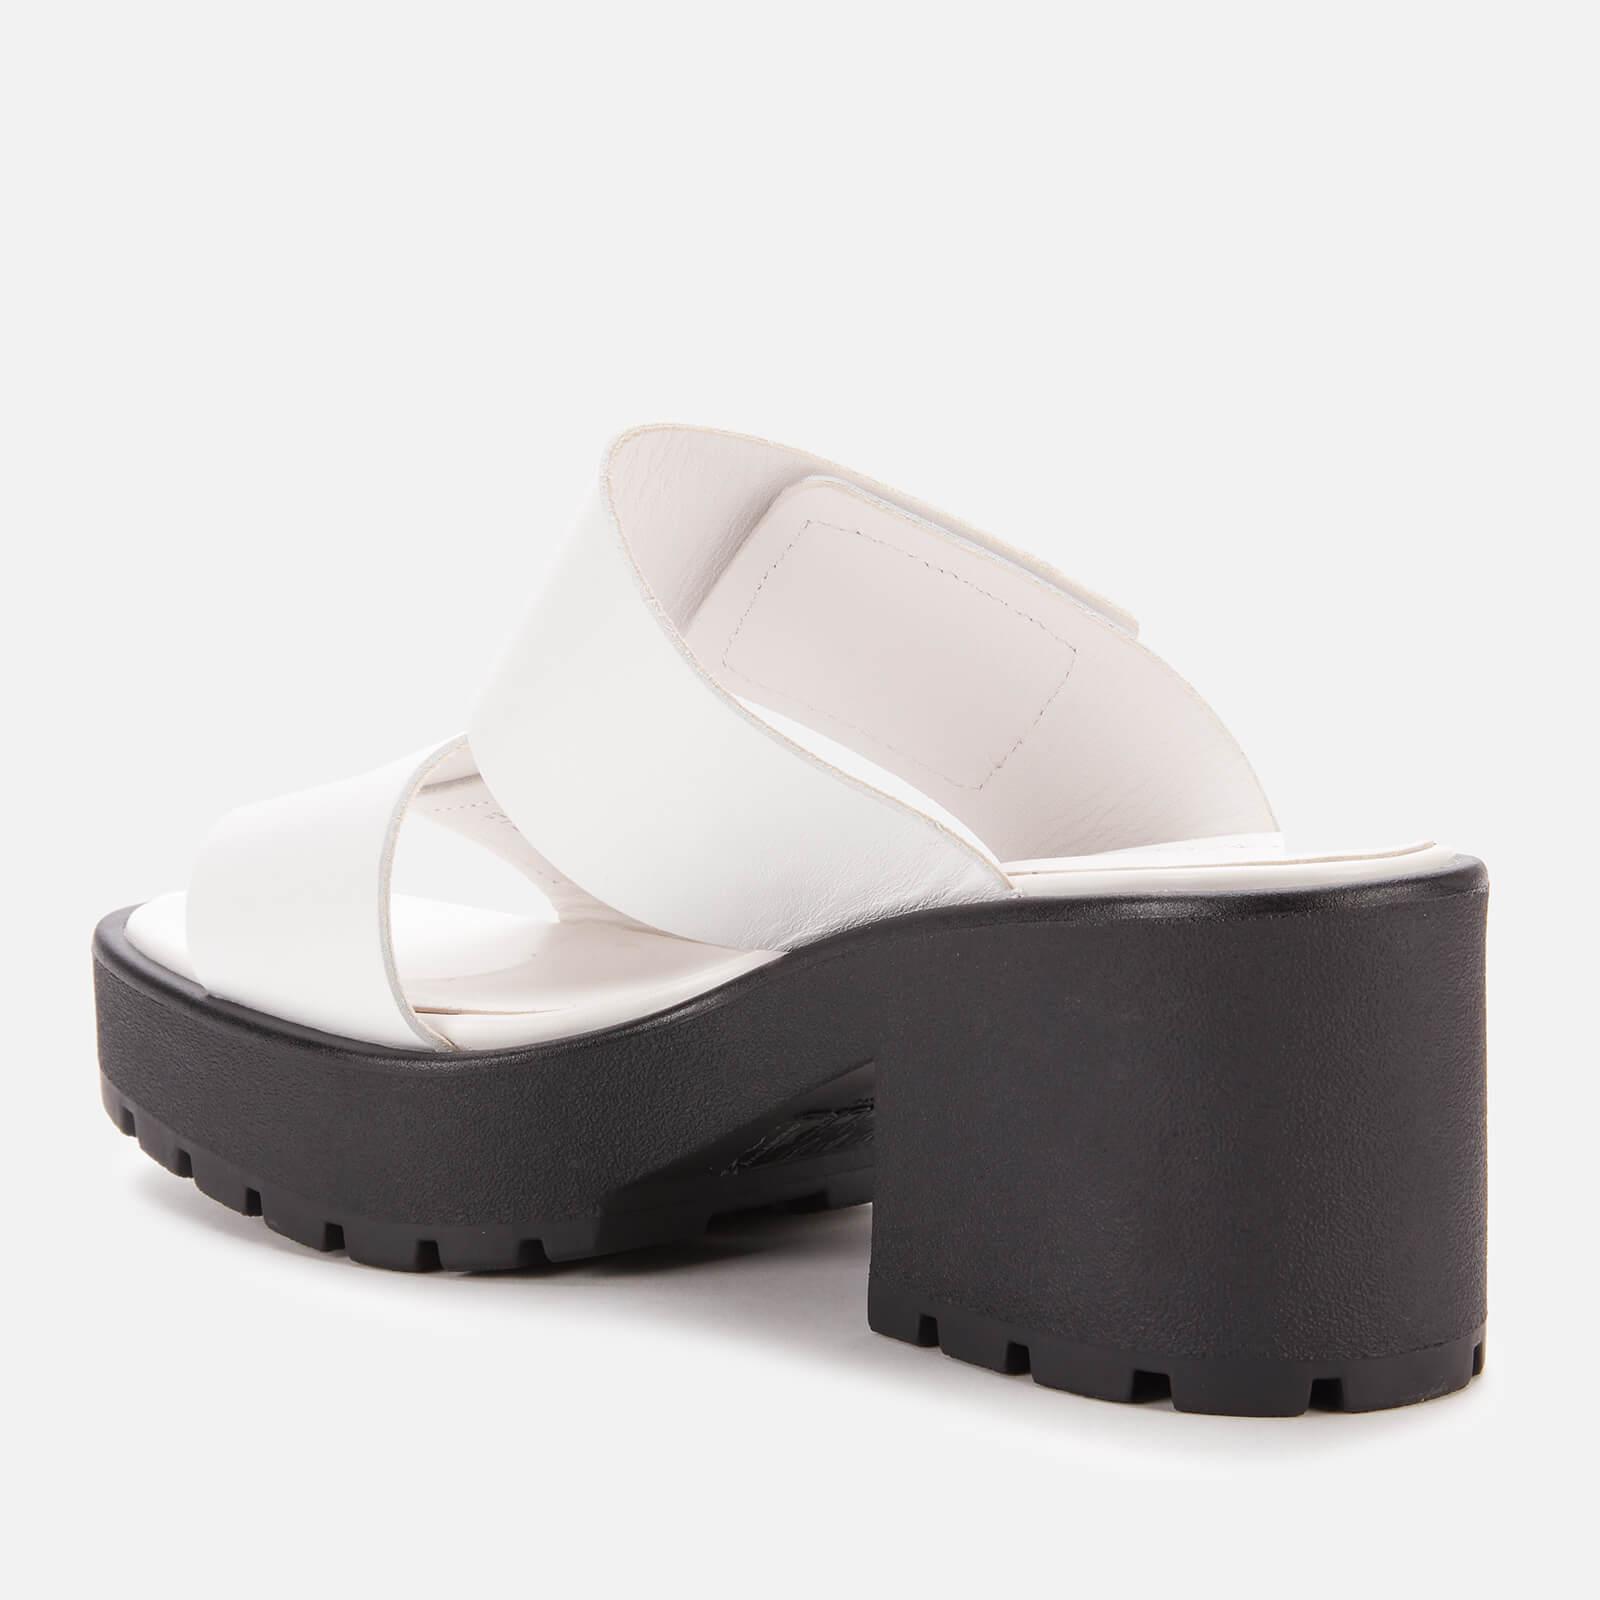 Vagabond Women's Dioon Leather Heeled Mules - White - Uk 4